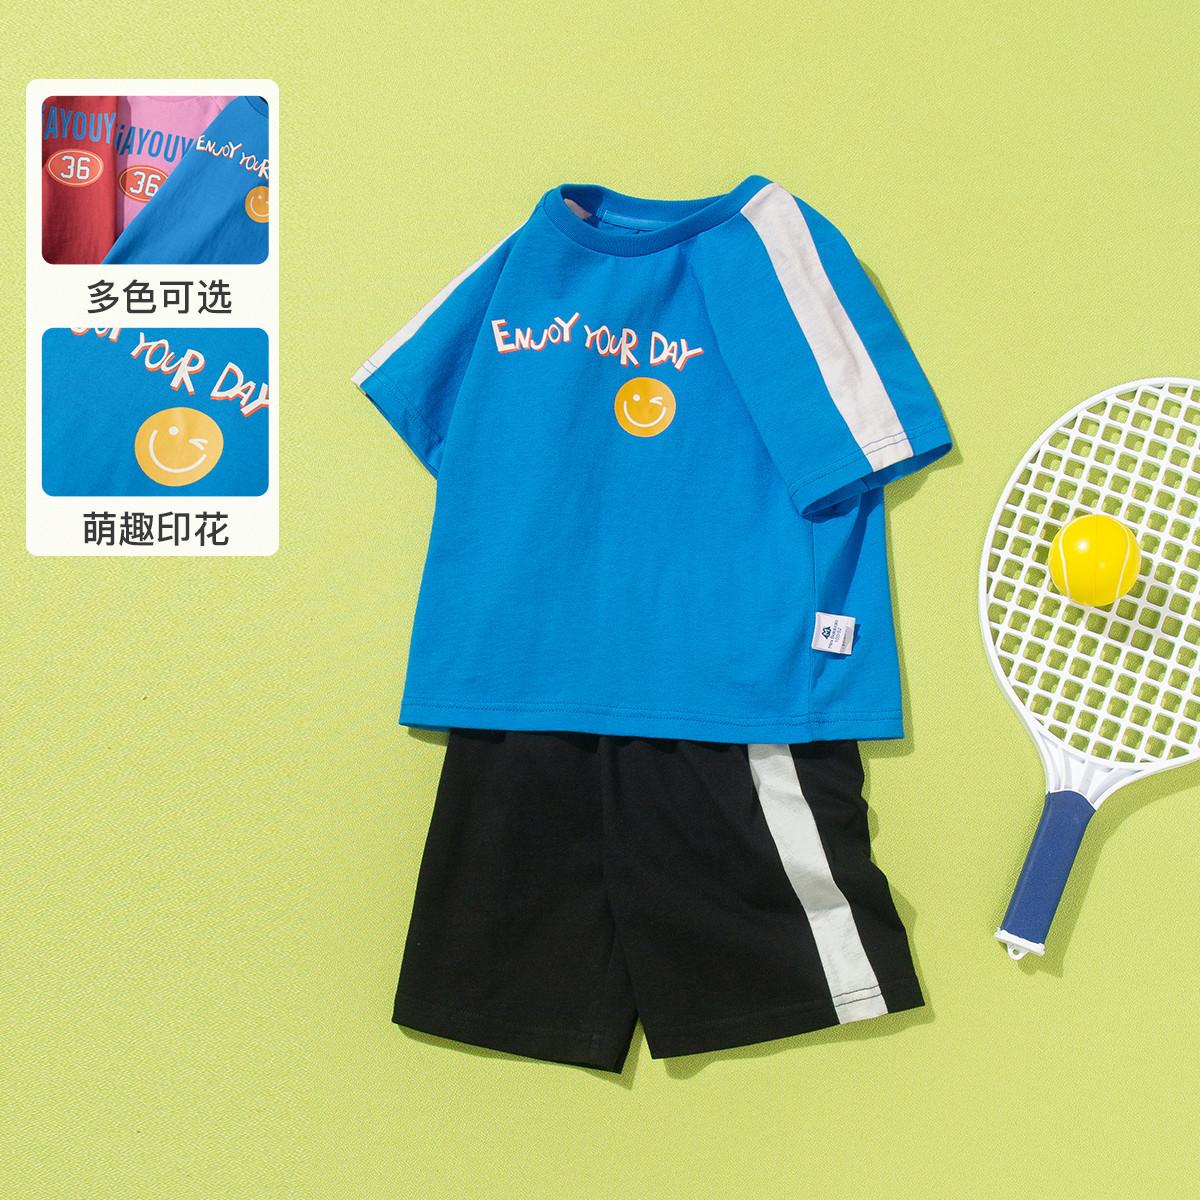 Mini Balabala 迷你巴拉巴拉 男童学院风夏季运动套装